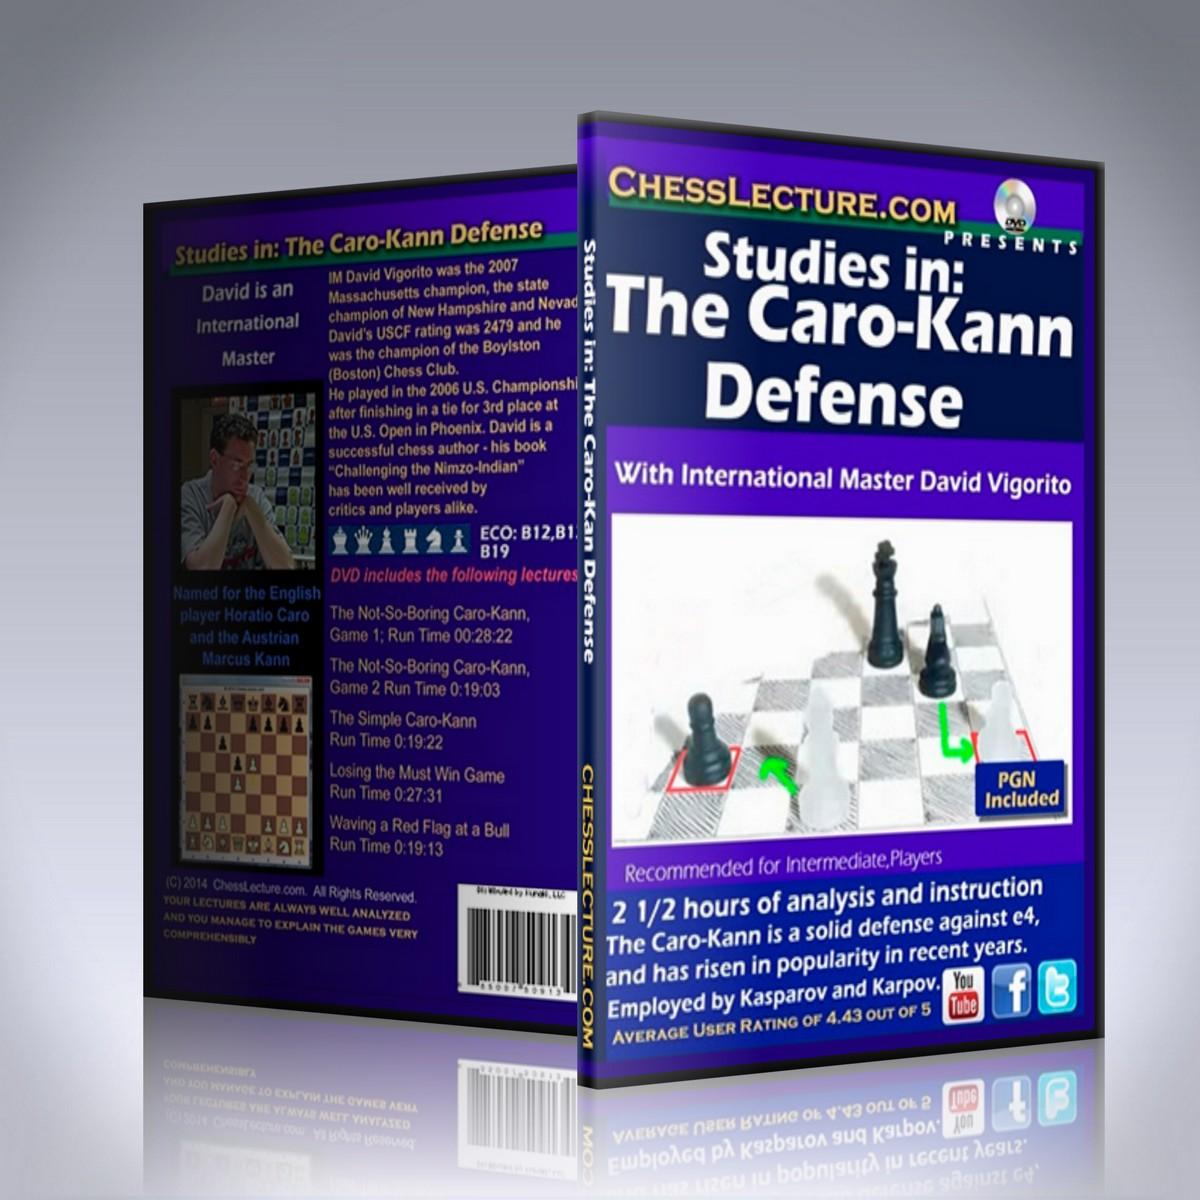 Studies in: The Caro-Kann Defense – IM David Vigorito